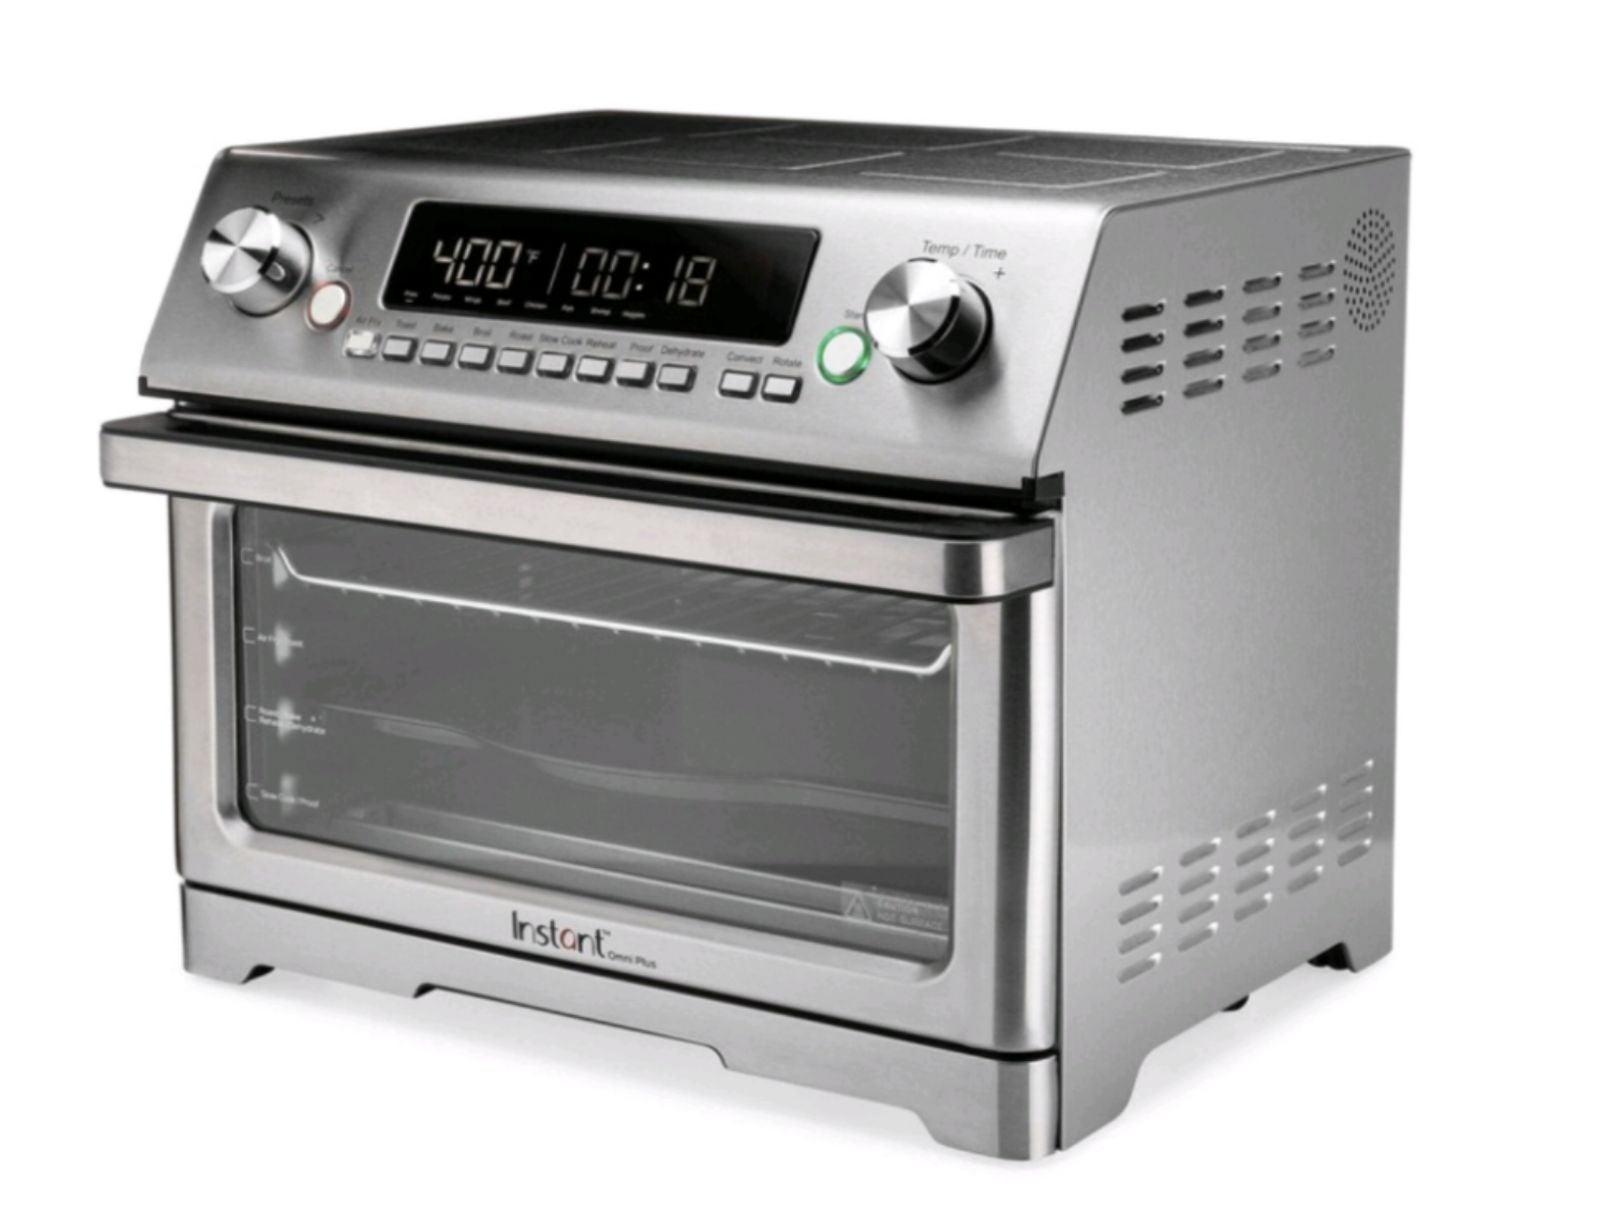 Instant Omni Plus 11 in 1 Air Fryer